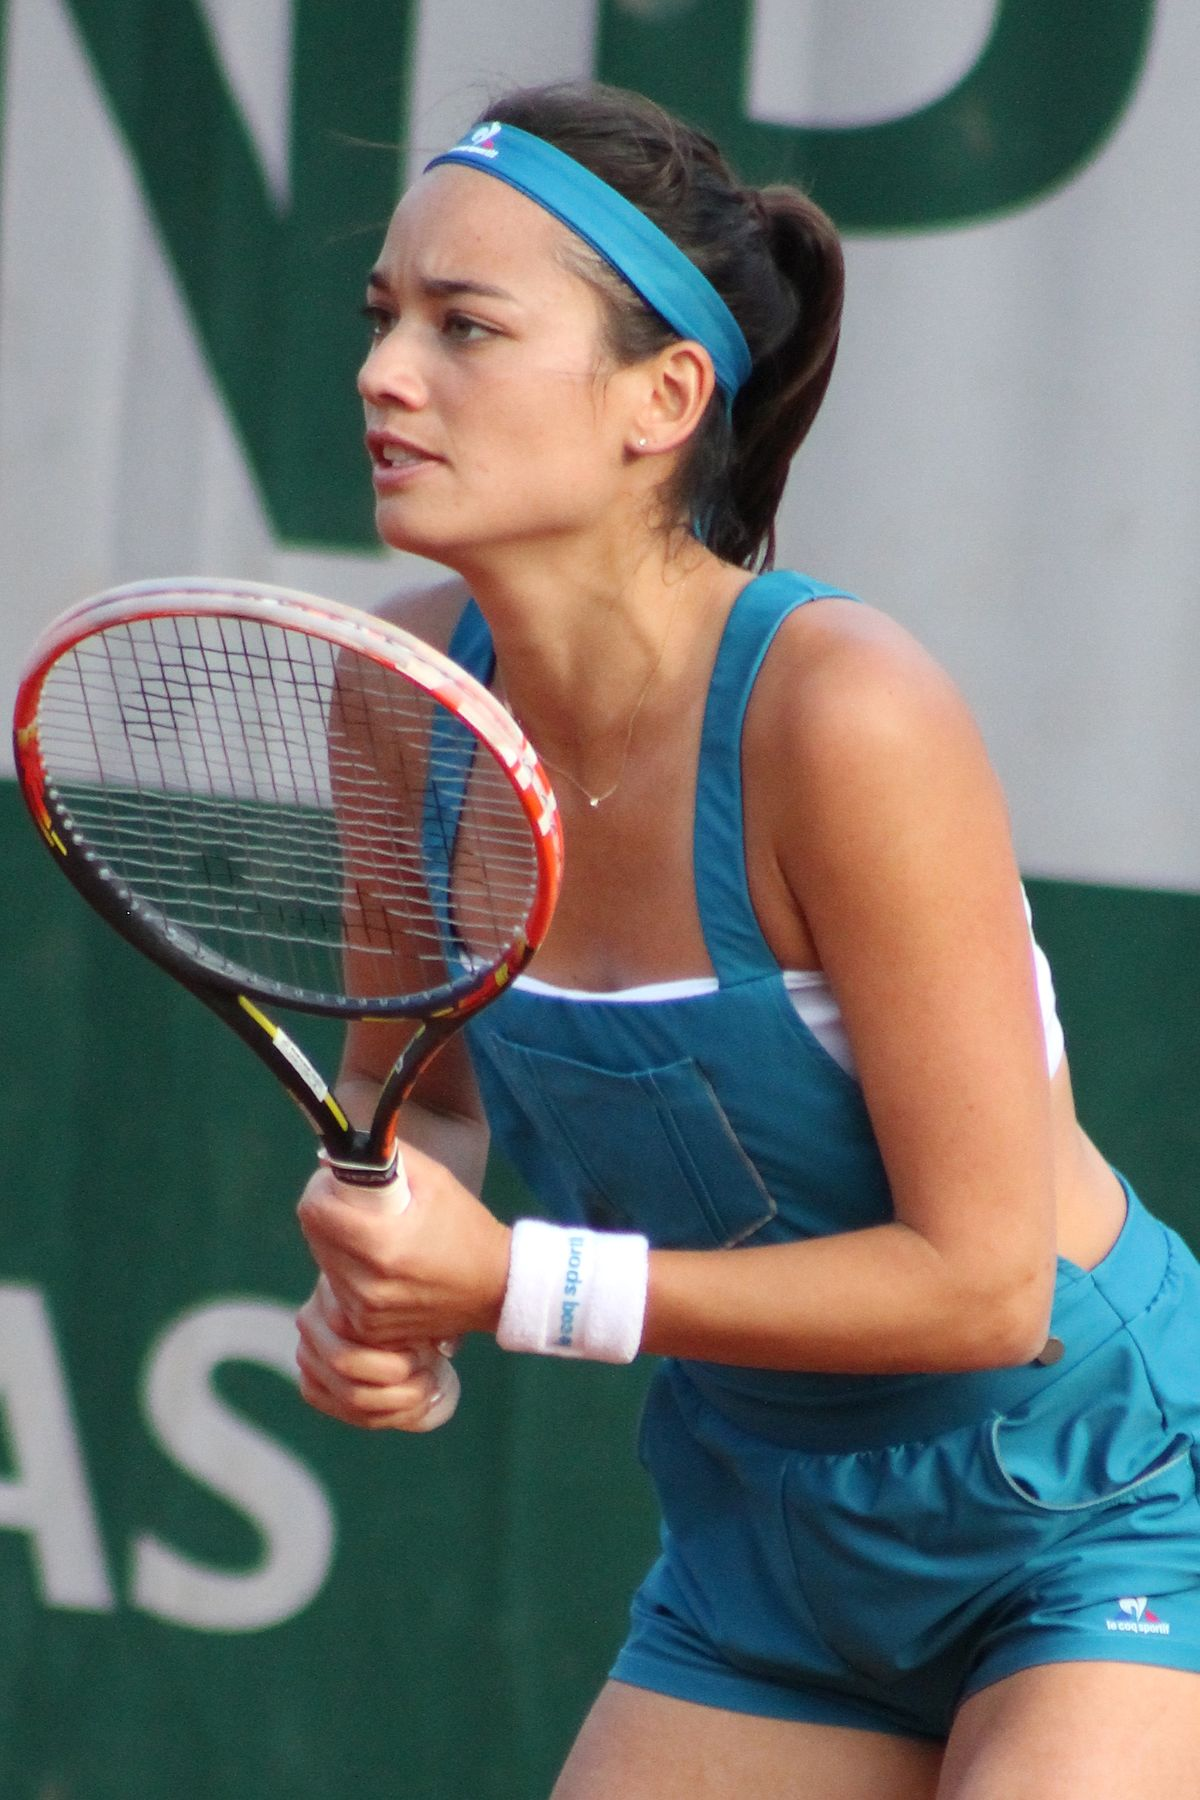 Alize Lim